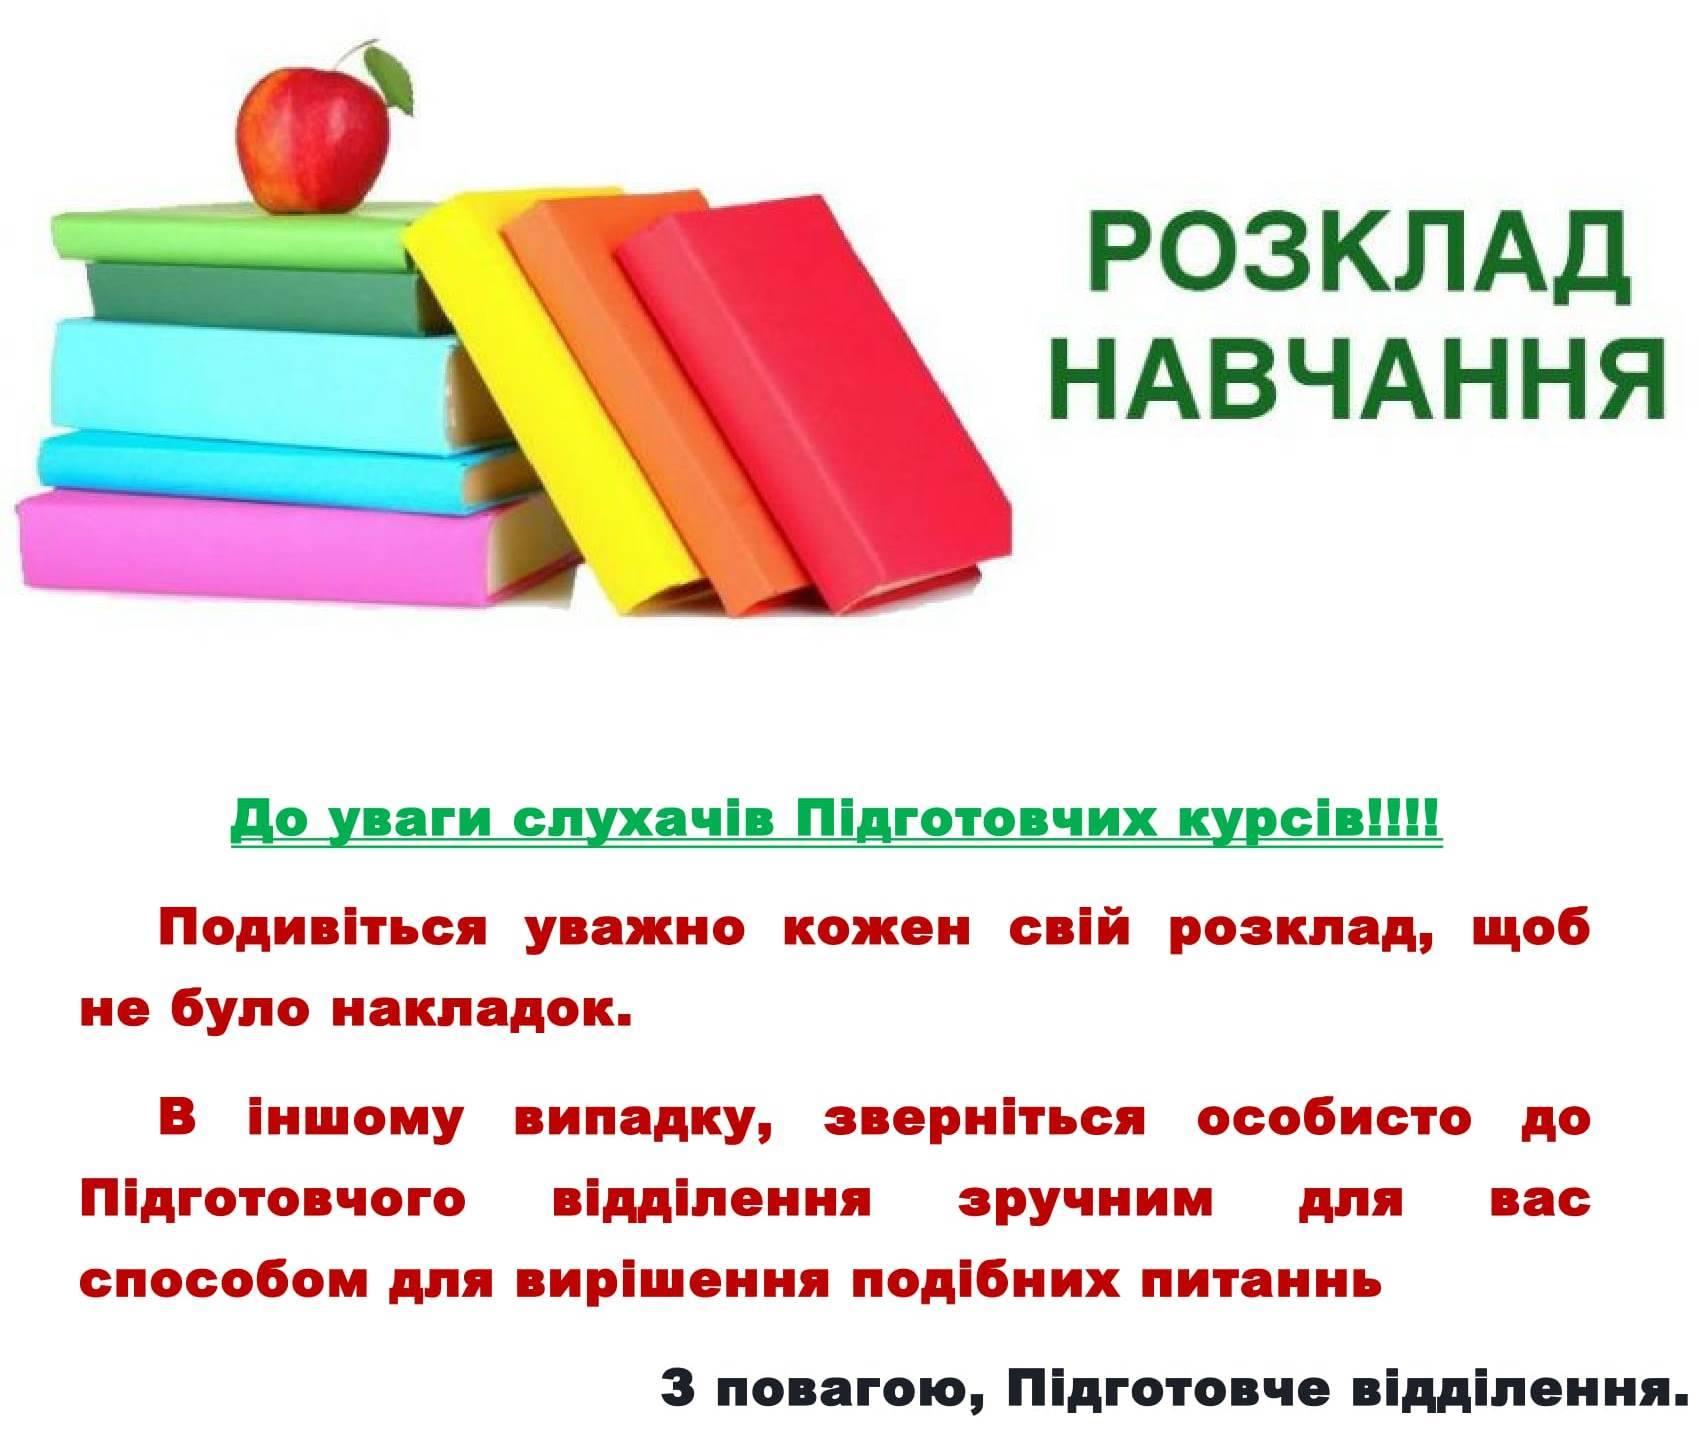 23134890_1466355943412866_526186478_o